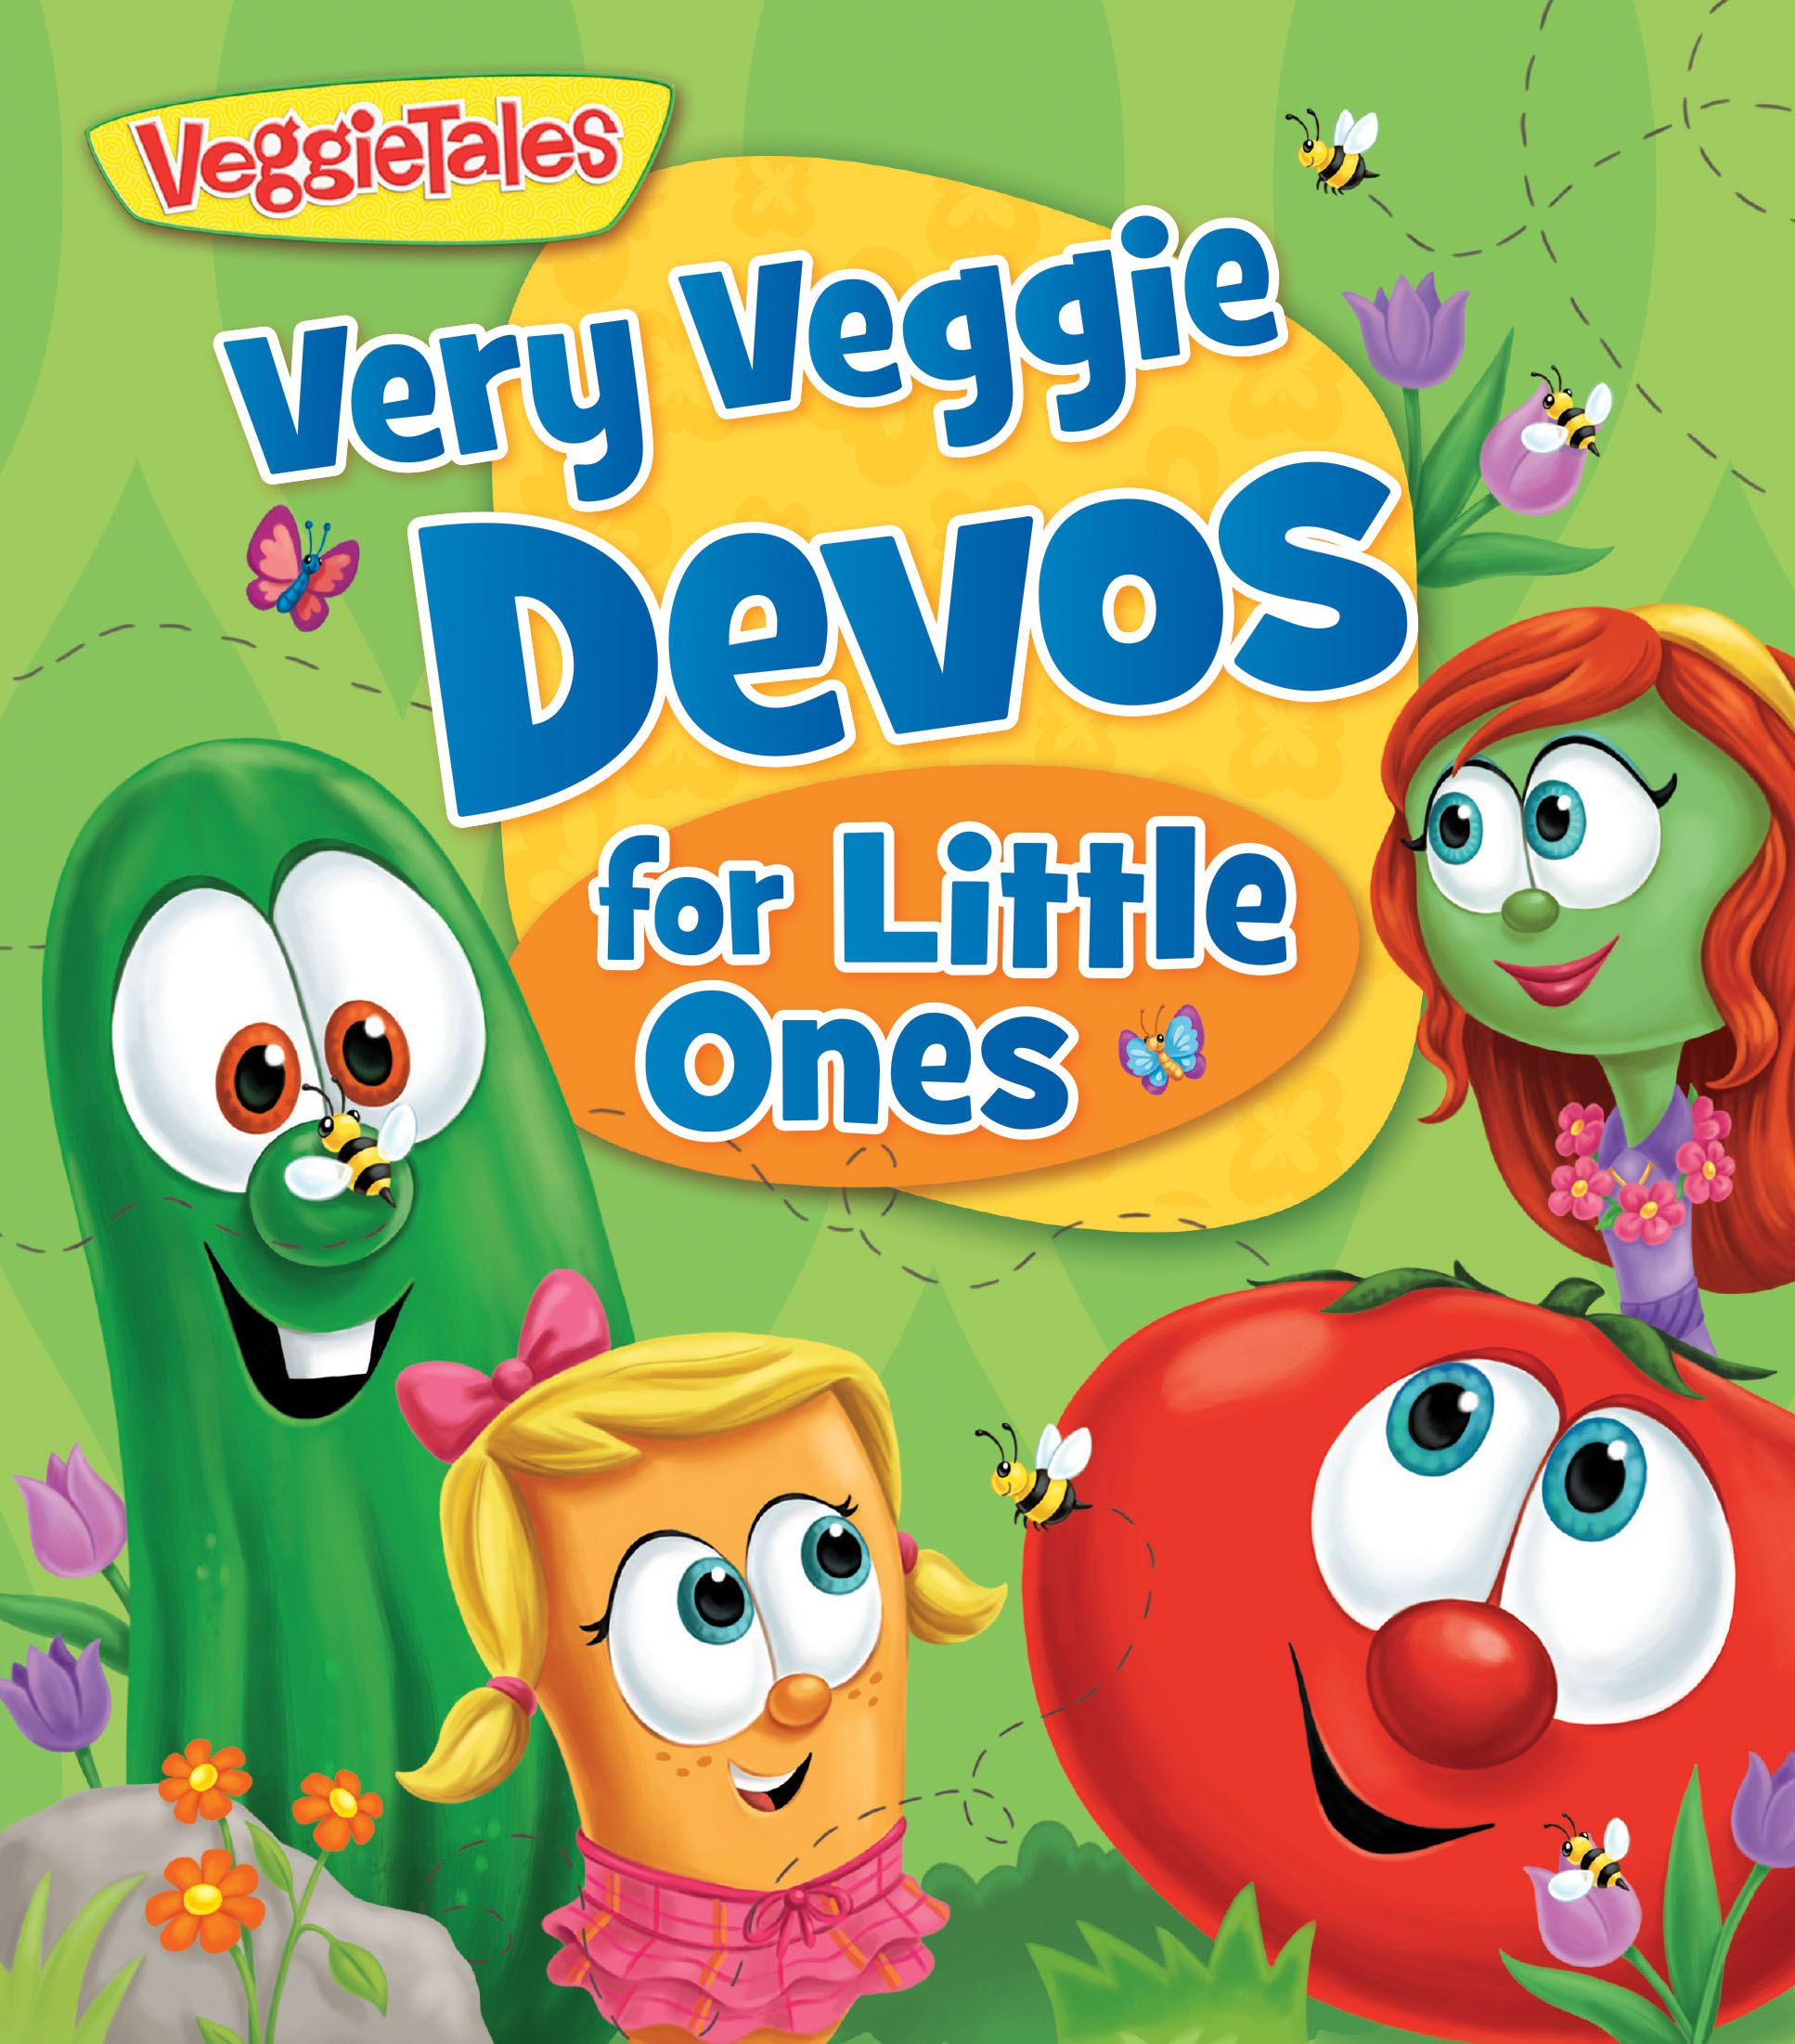 Very Veggie Devos for Little Ones Veggietales, Board Book, Books Online,  Joyful,